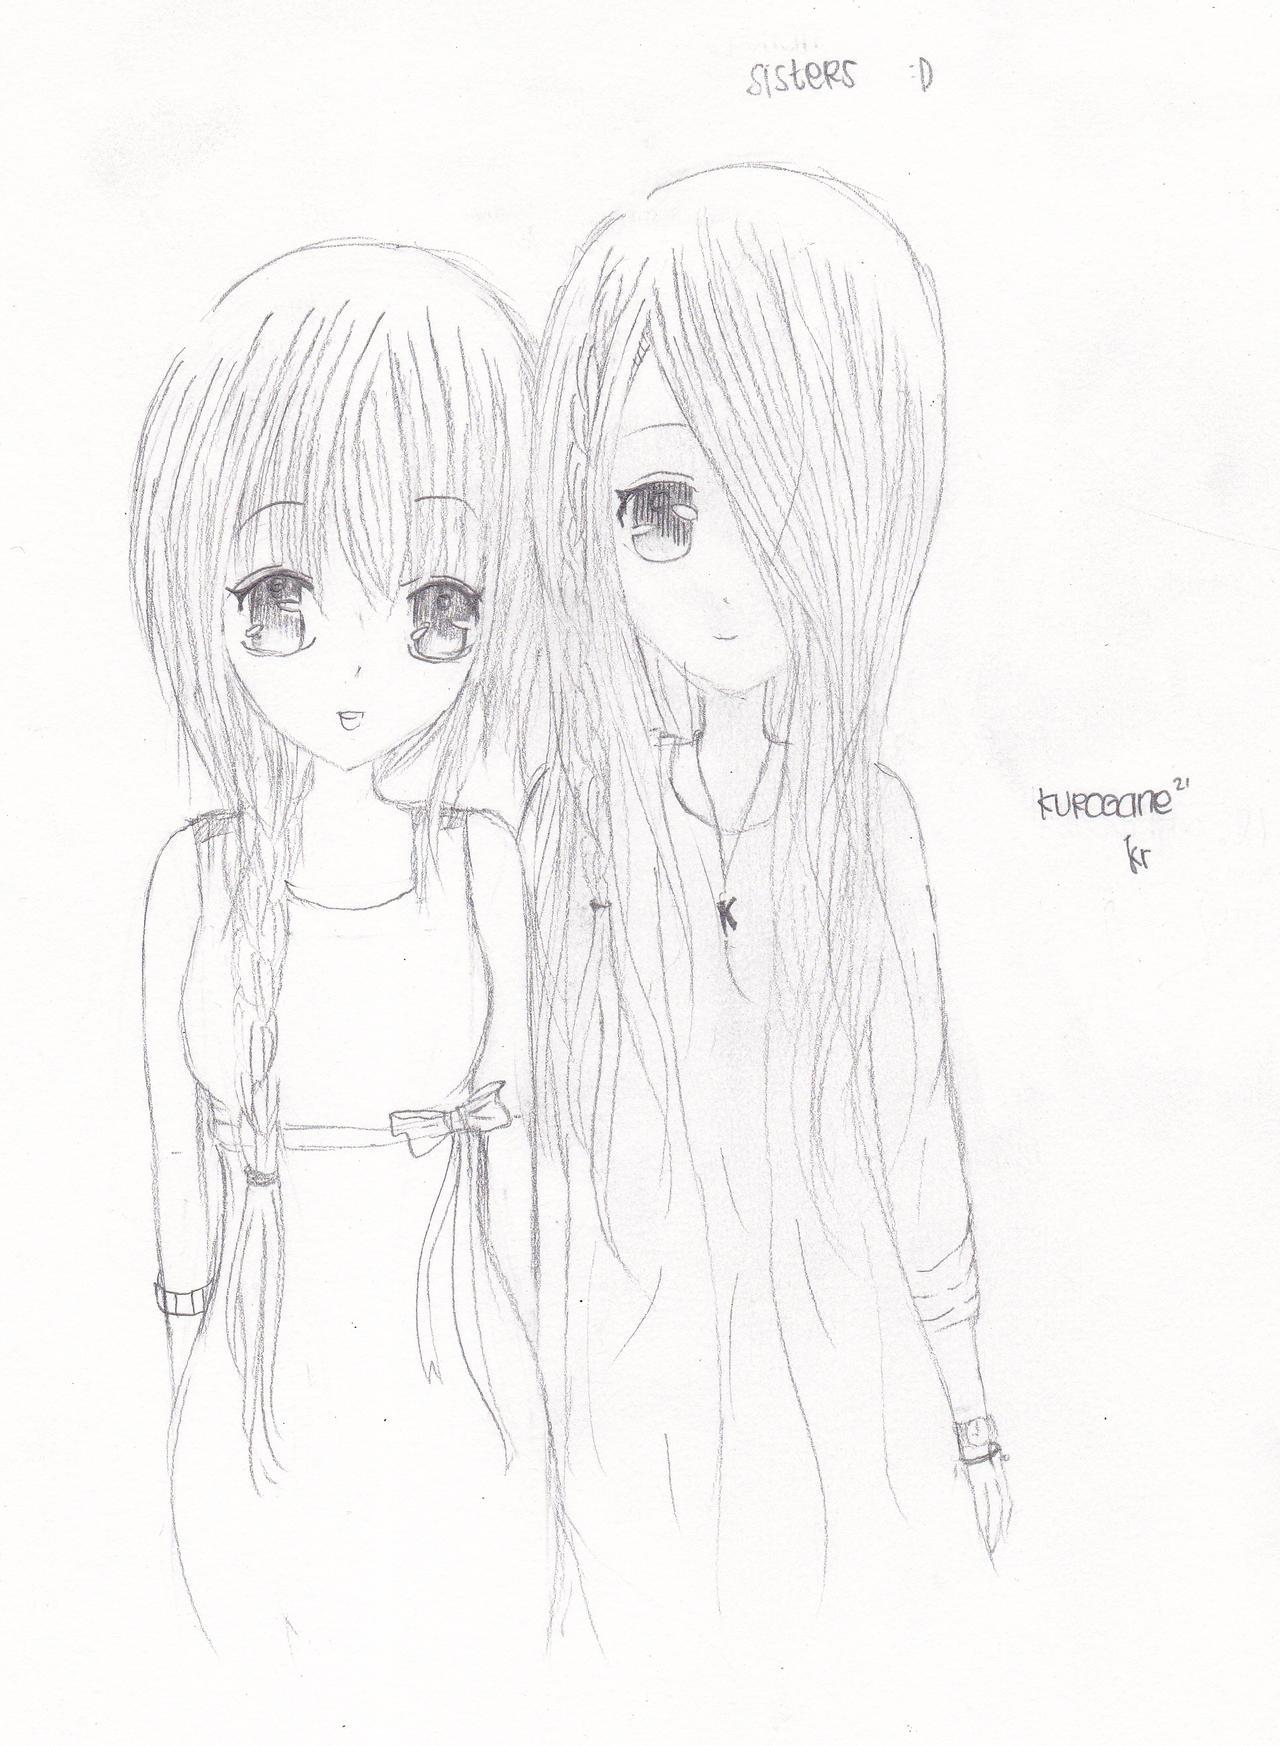 RandomGirl with 2 and 1 eyes by kuroganeko on DeviantArt